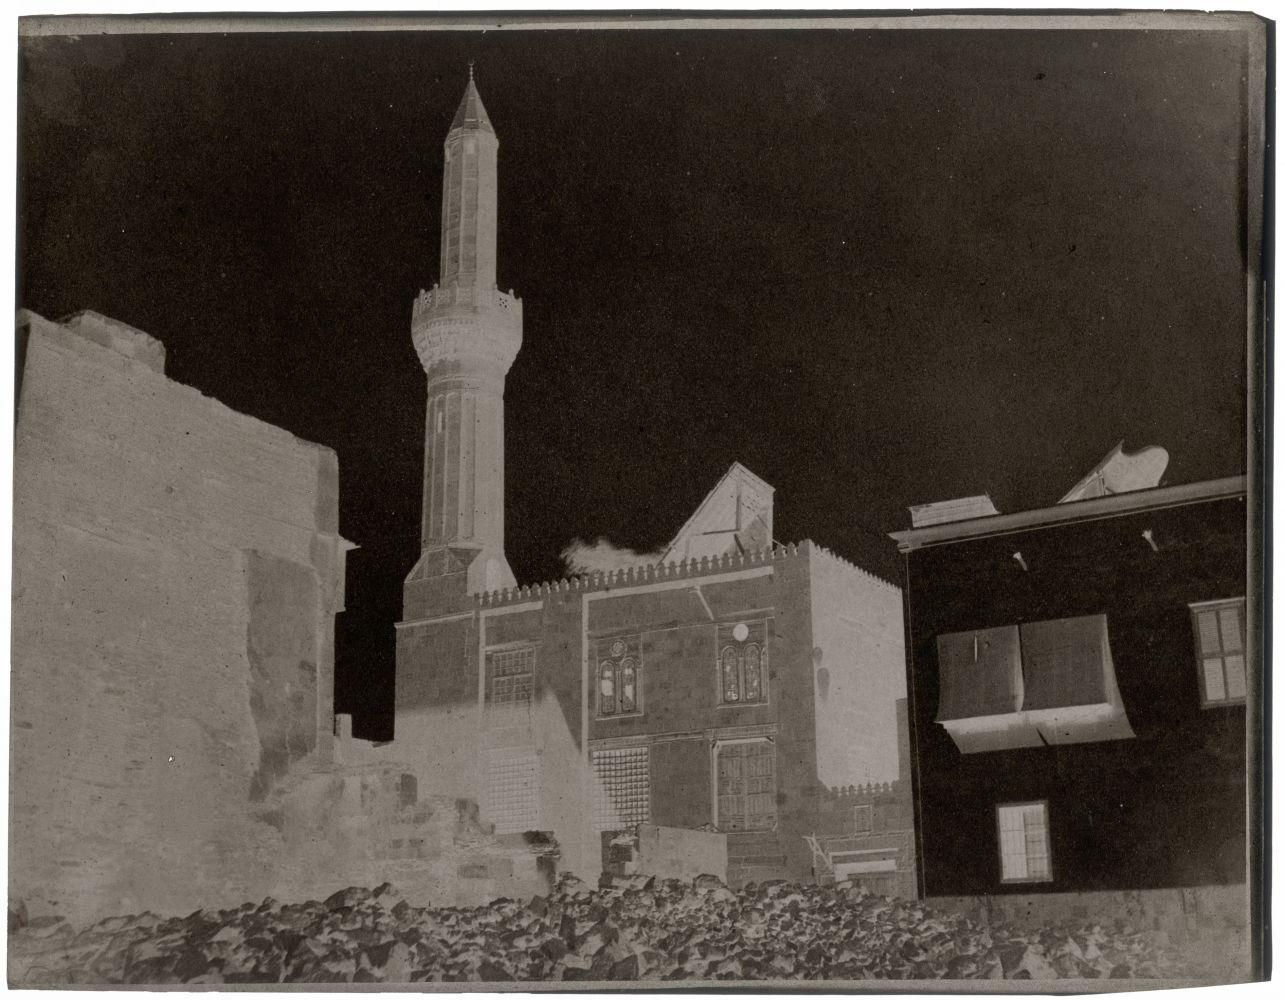 John Beasley GREENE (American, born in France, 1832-1856) Ottoman minaret, Cairo, 1854-1855 Waxed paper negative 24.7 x 31.5 cm